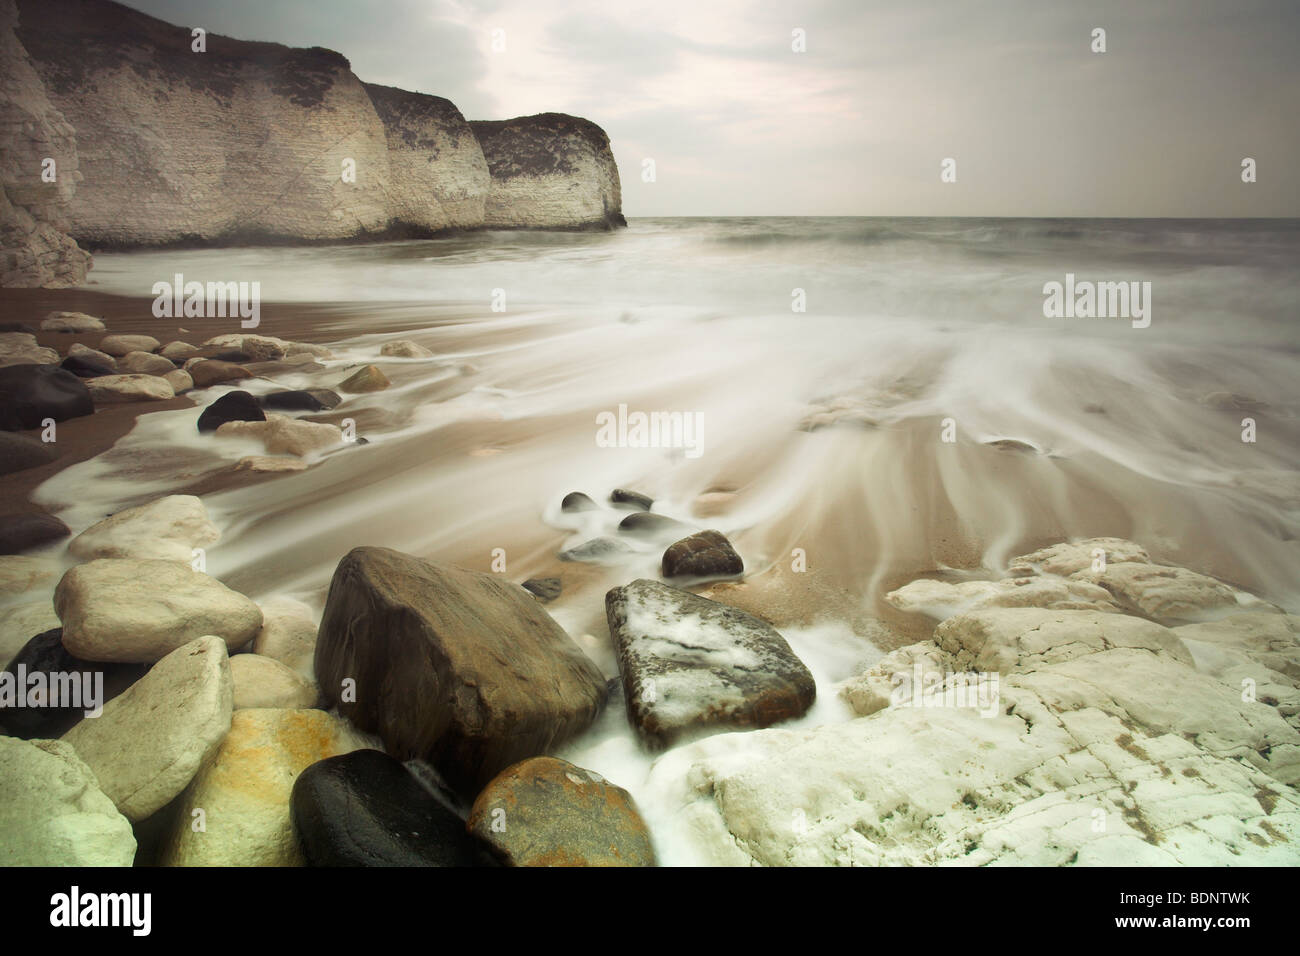 A coastline with chalk cliffs - Stock Image